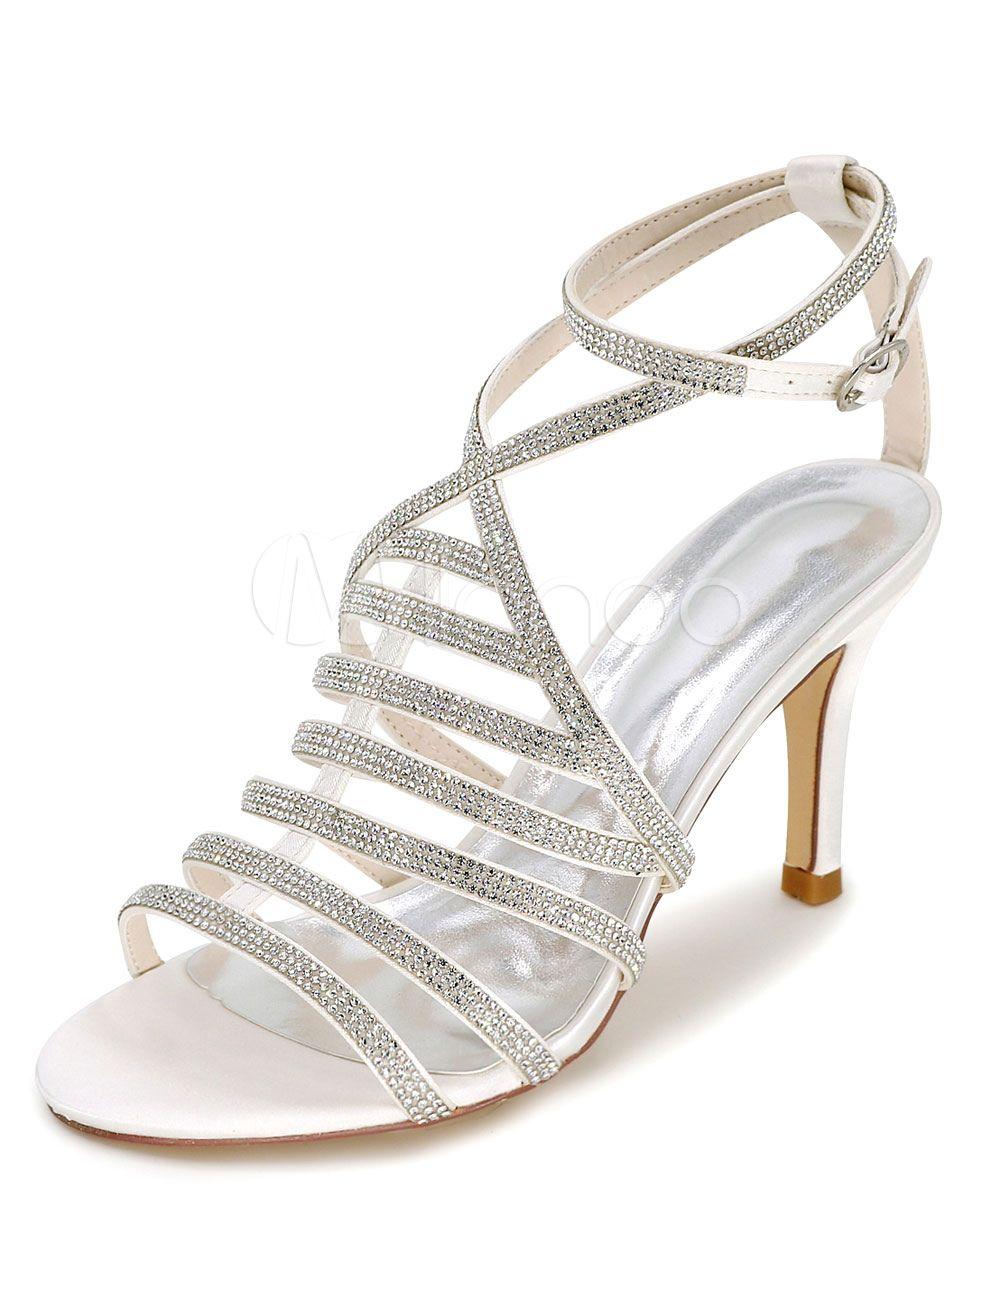 7dd16df00 Wedding Shoes, zapato de boda ,Wedding Shoes Gladiator Sandals Women's High  Heel Rhinestones Ankle Strap Bridal Shoes